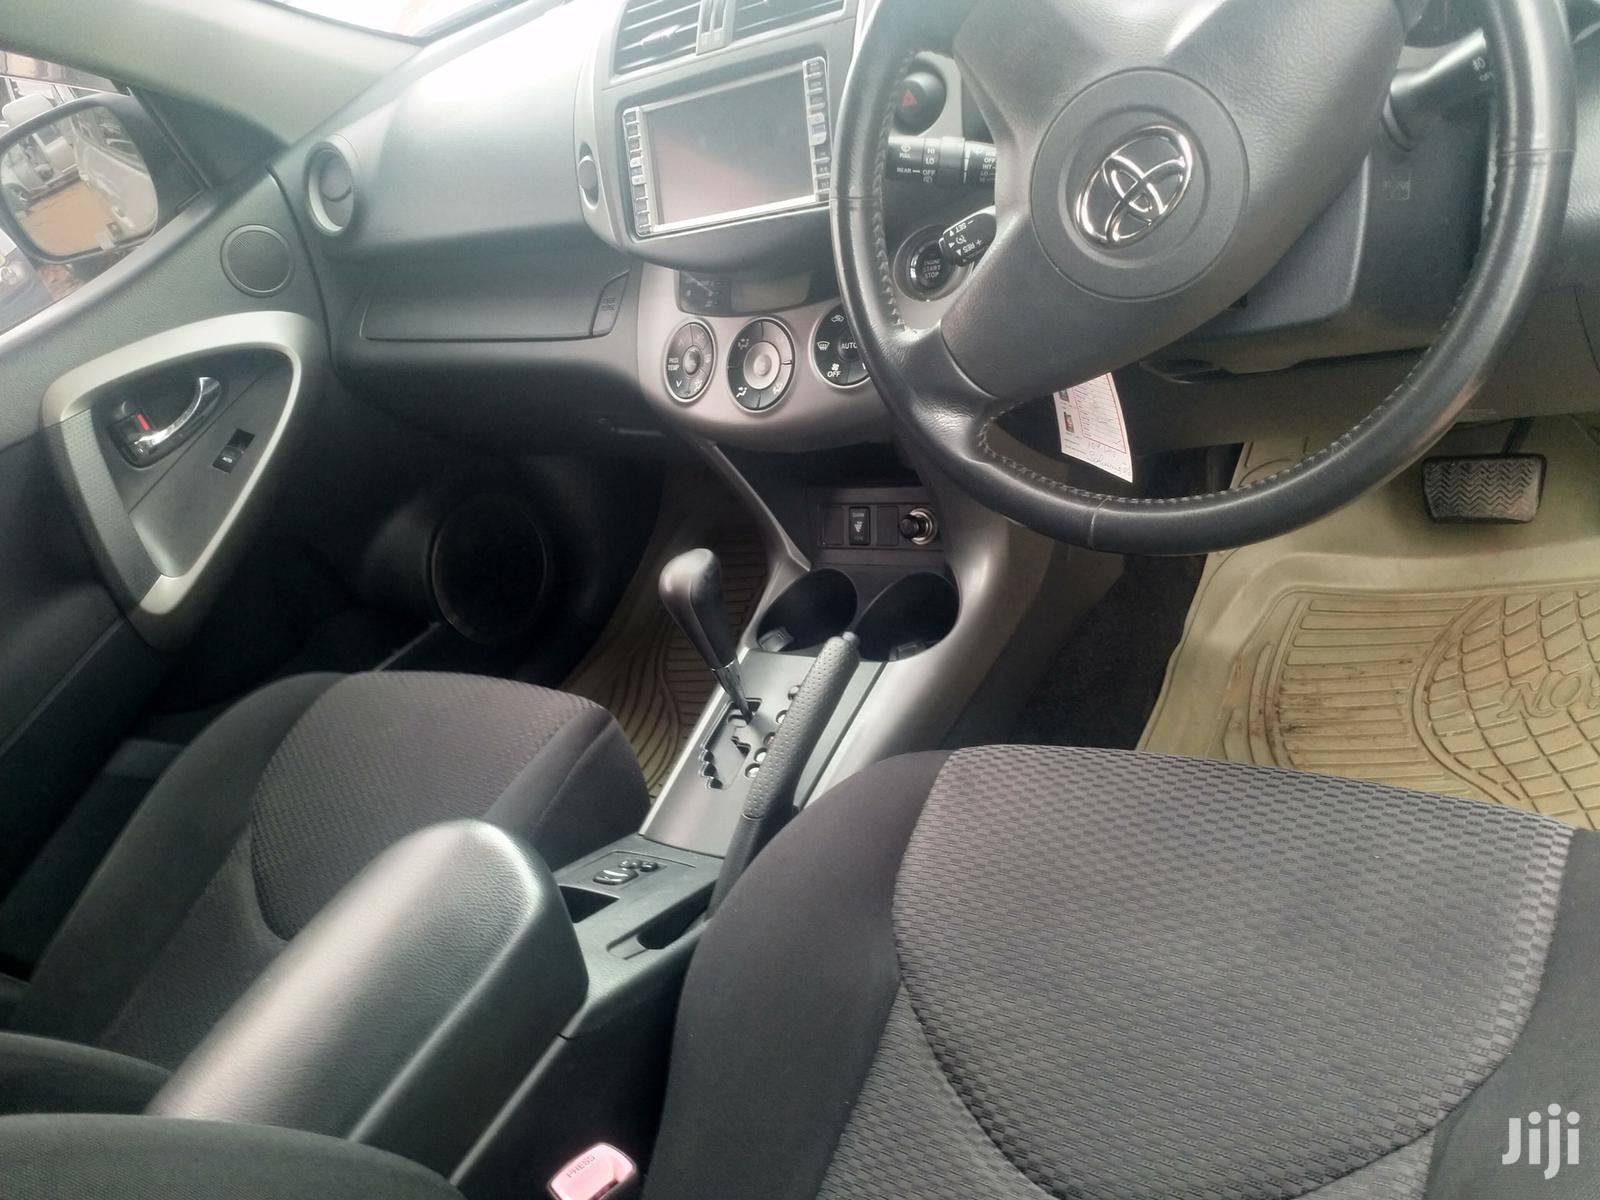 New Toyota RAV4 2006 2.0 4x4 VX Automatic Silver | Cars for sale in Kampala, Central Region, Uganda